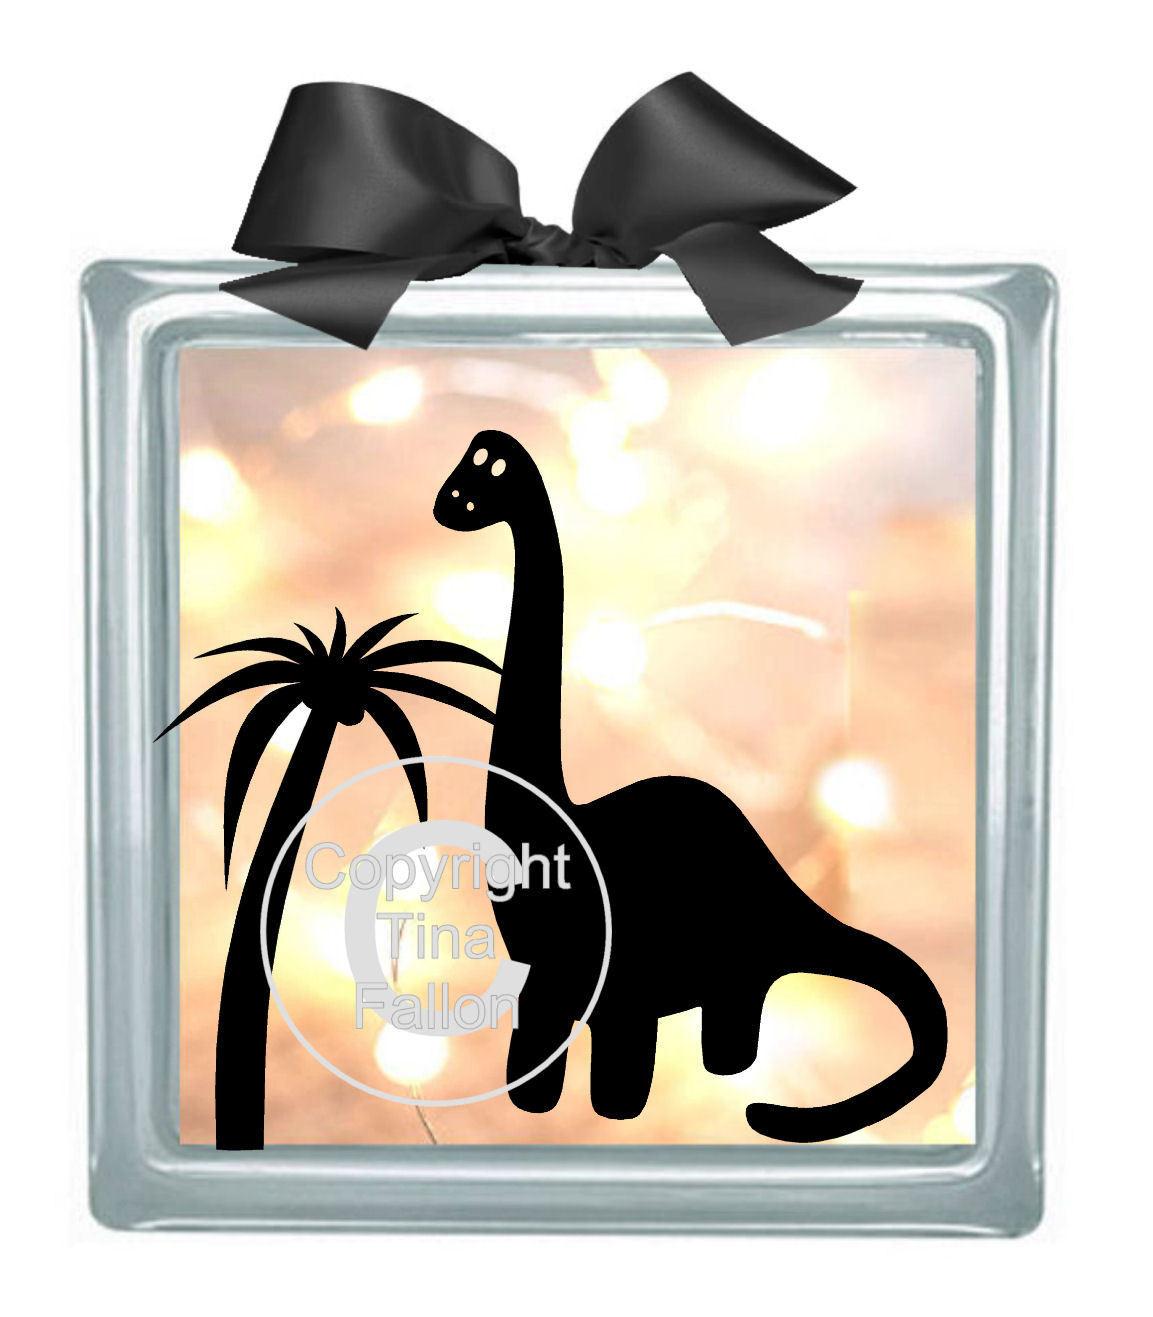 Dinosaur Glass Block Tile Design No 2